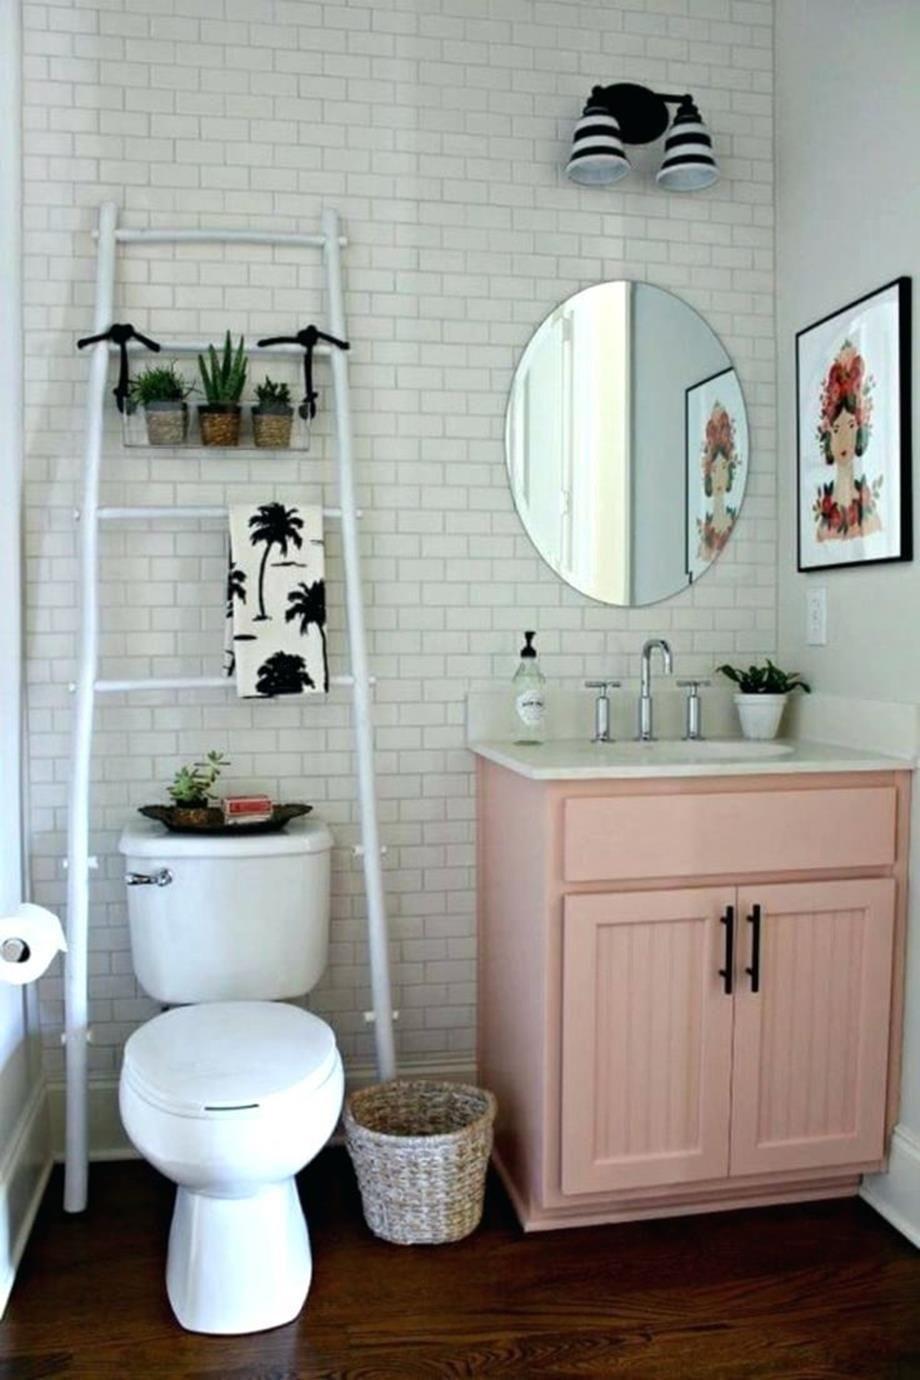 Small Apartment Bathroom Decorating Ideas On Budget